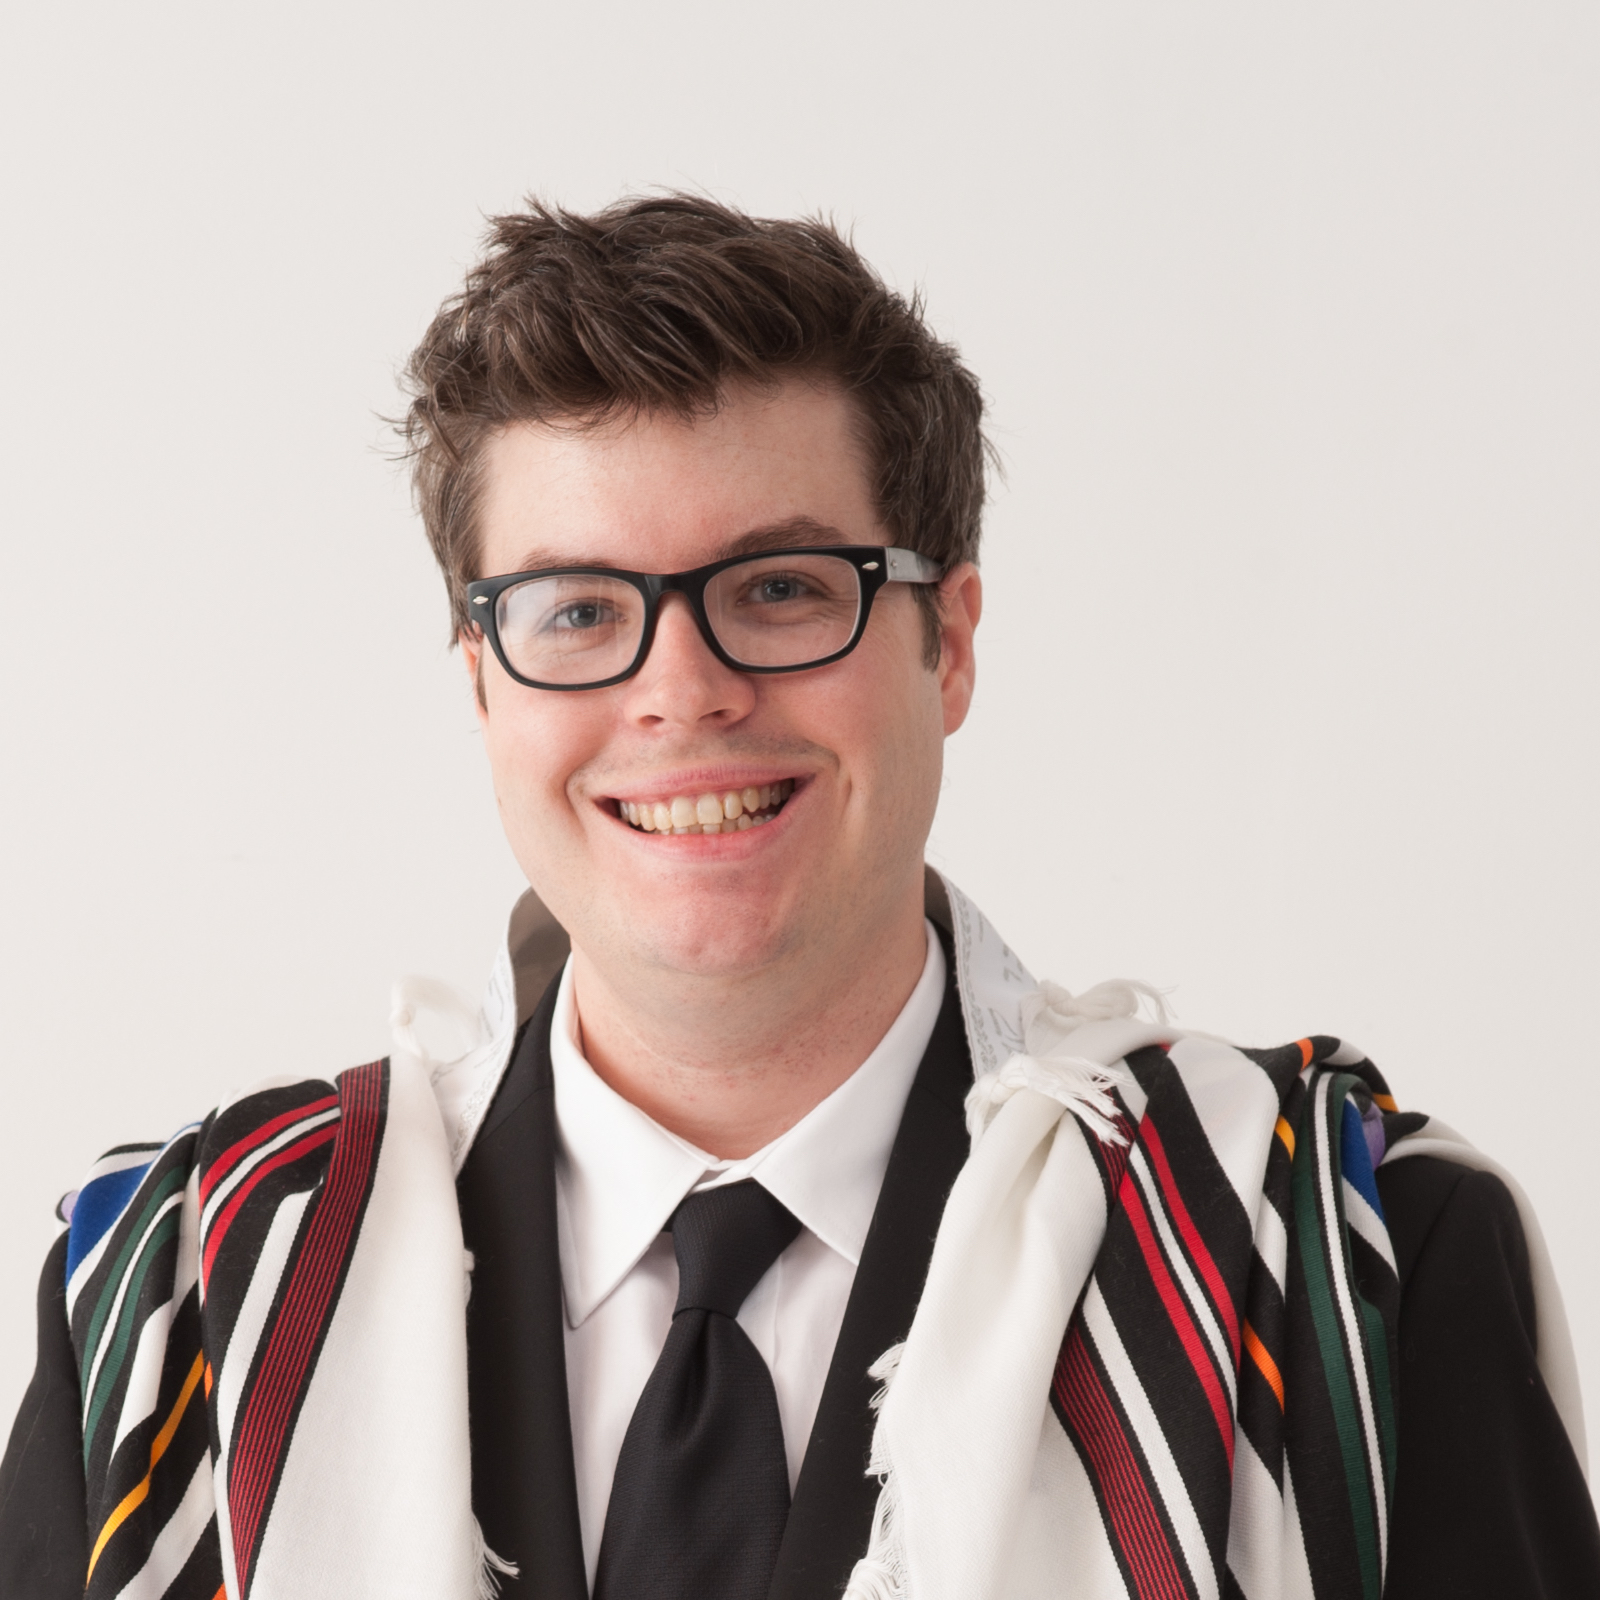 Rabbi Patrick Podcast